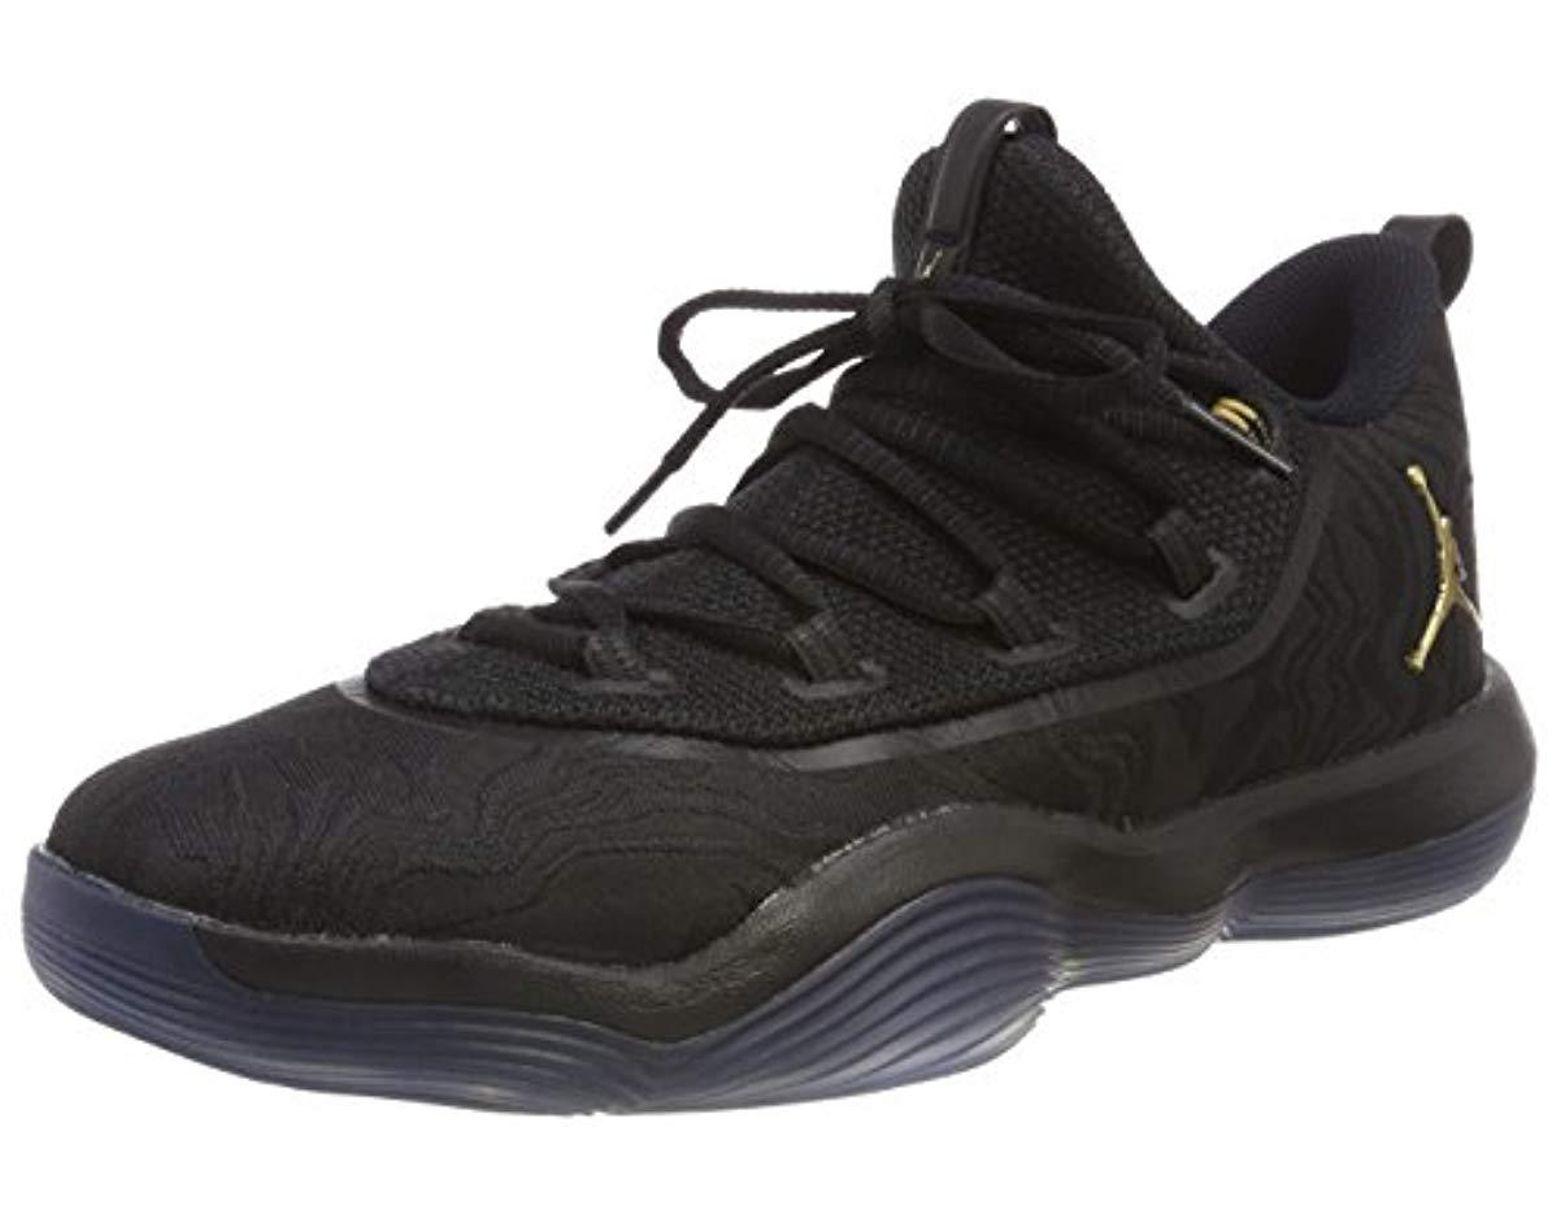 3805e3b327fba Men's Black Jordan Super.fly 2017 Low Basketball Shoes